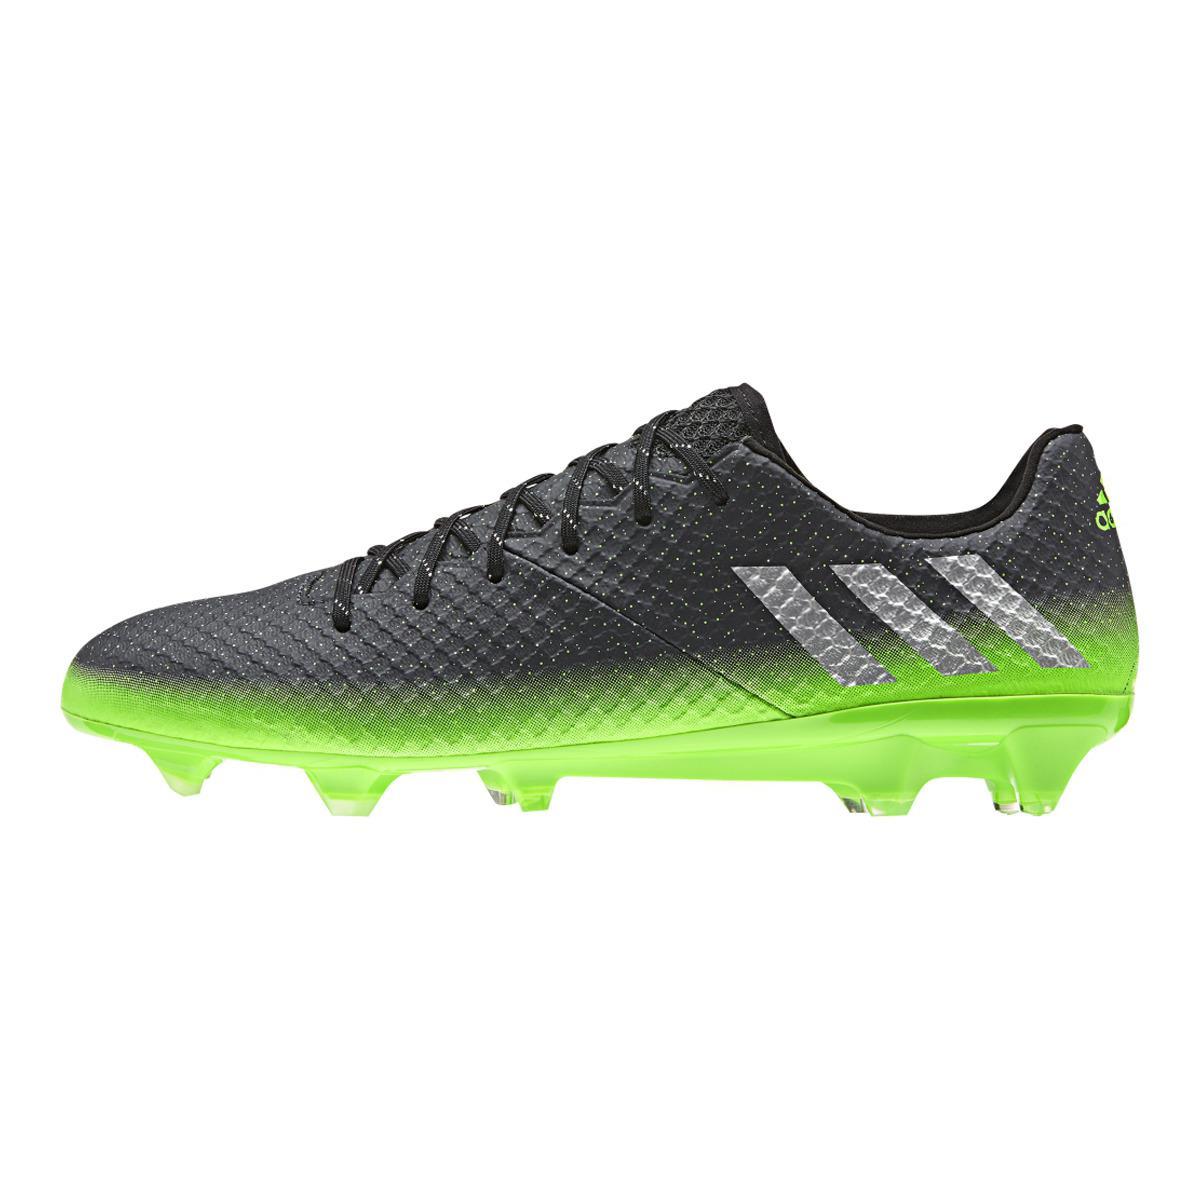 Adidas Originals Messi 16 1 Fg Football Boots In Green For Men Lyst